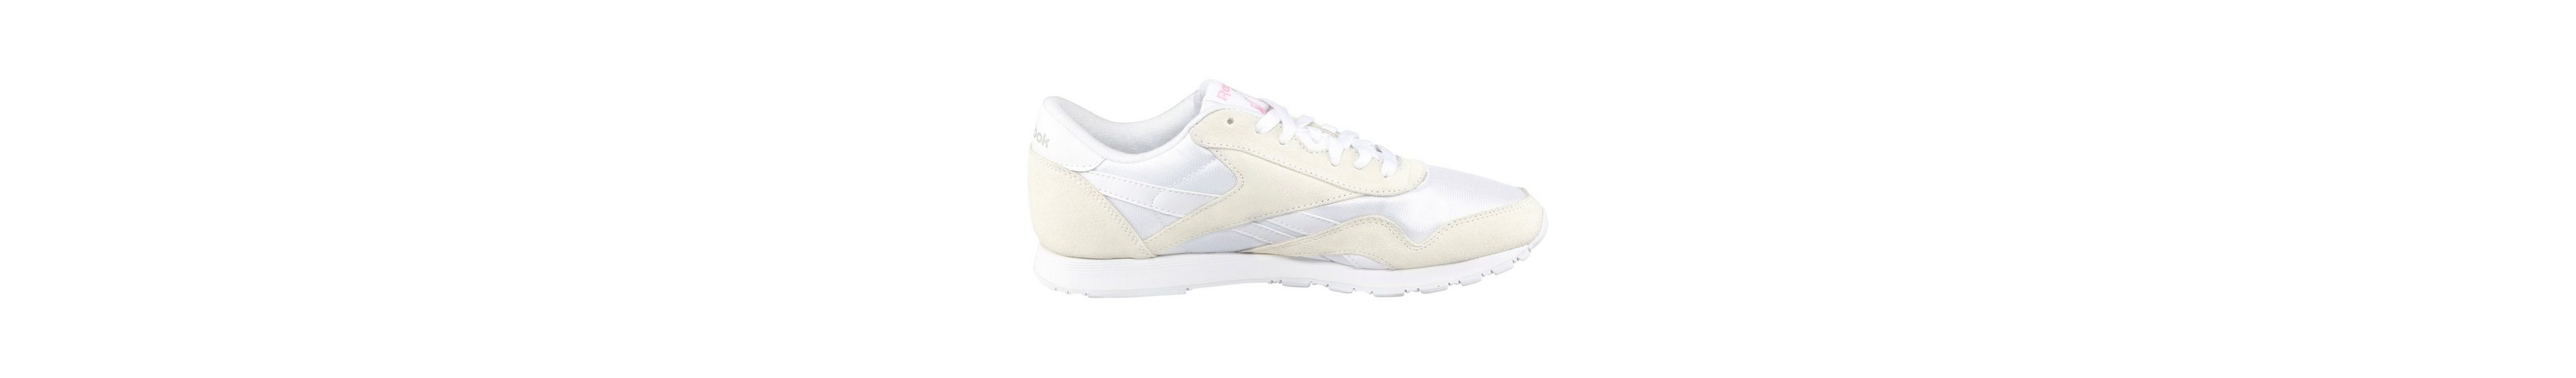 Reebok Classic Nylon W Sneaker Finden Große Günstig Online tVZVMys